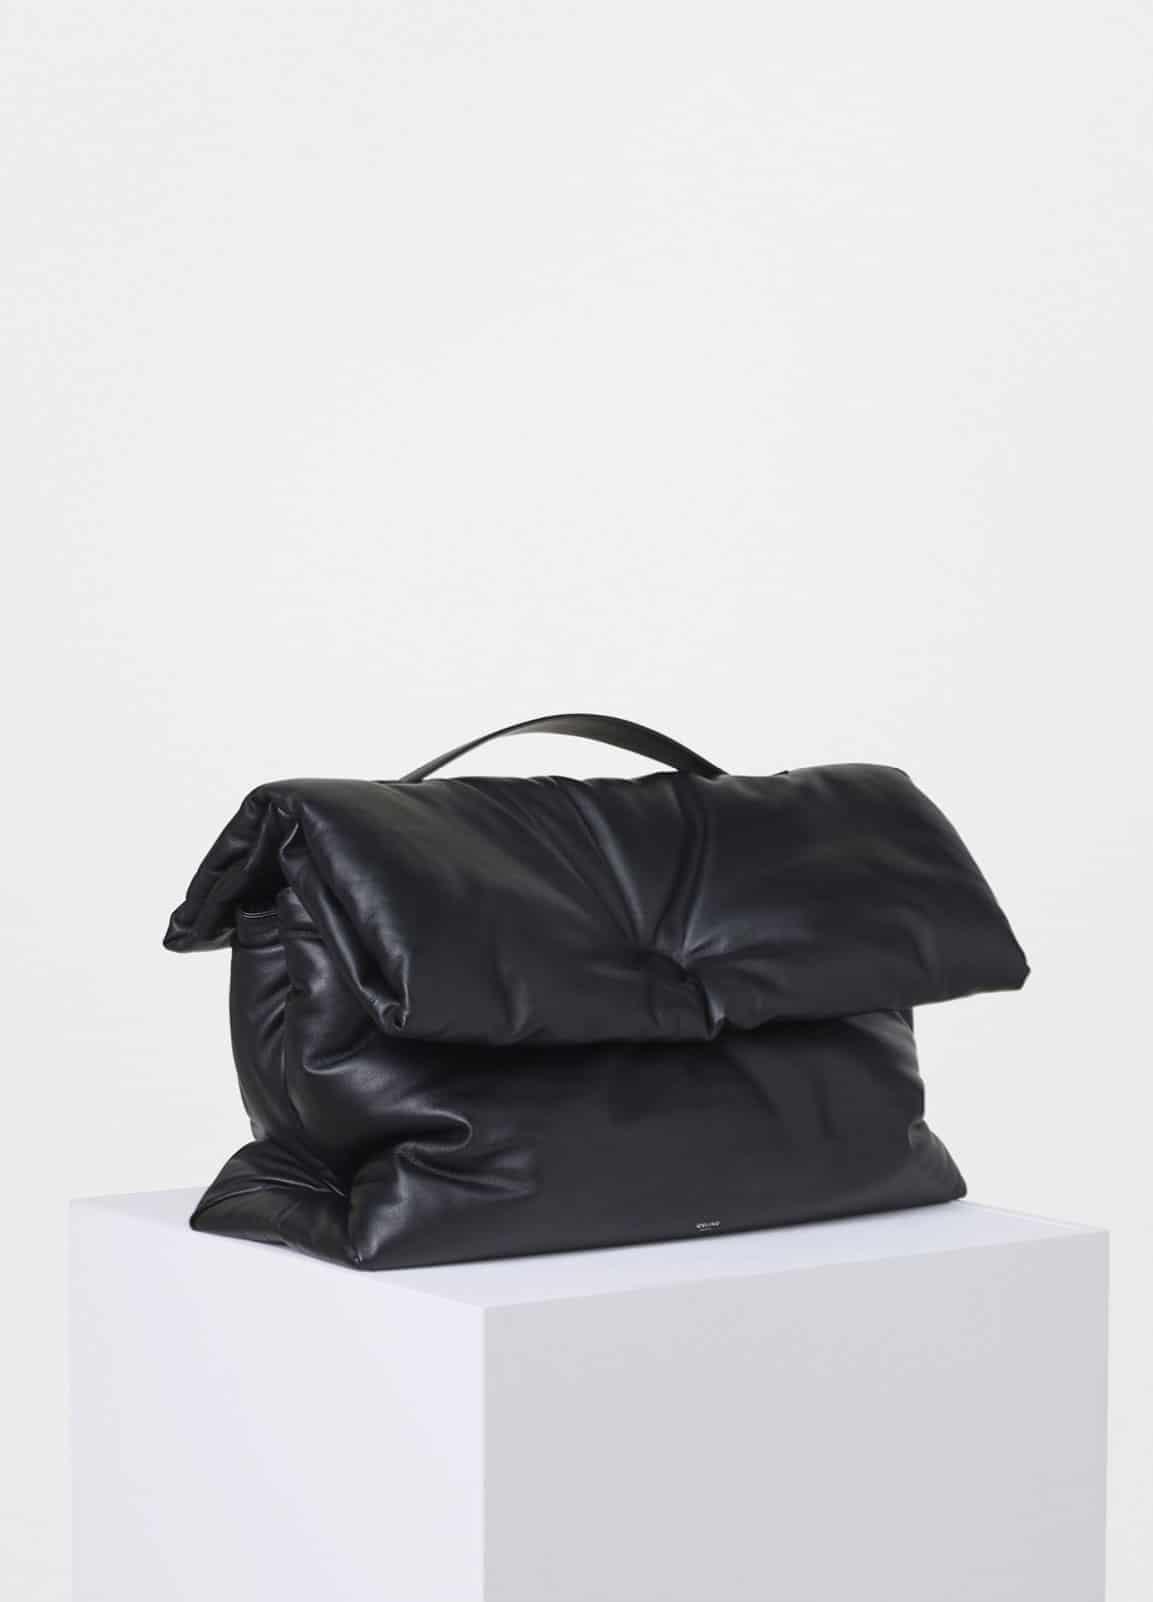 celine bags online - celine white cloth handbag